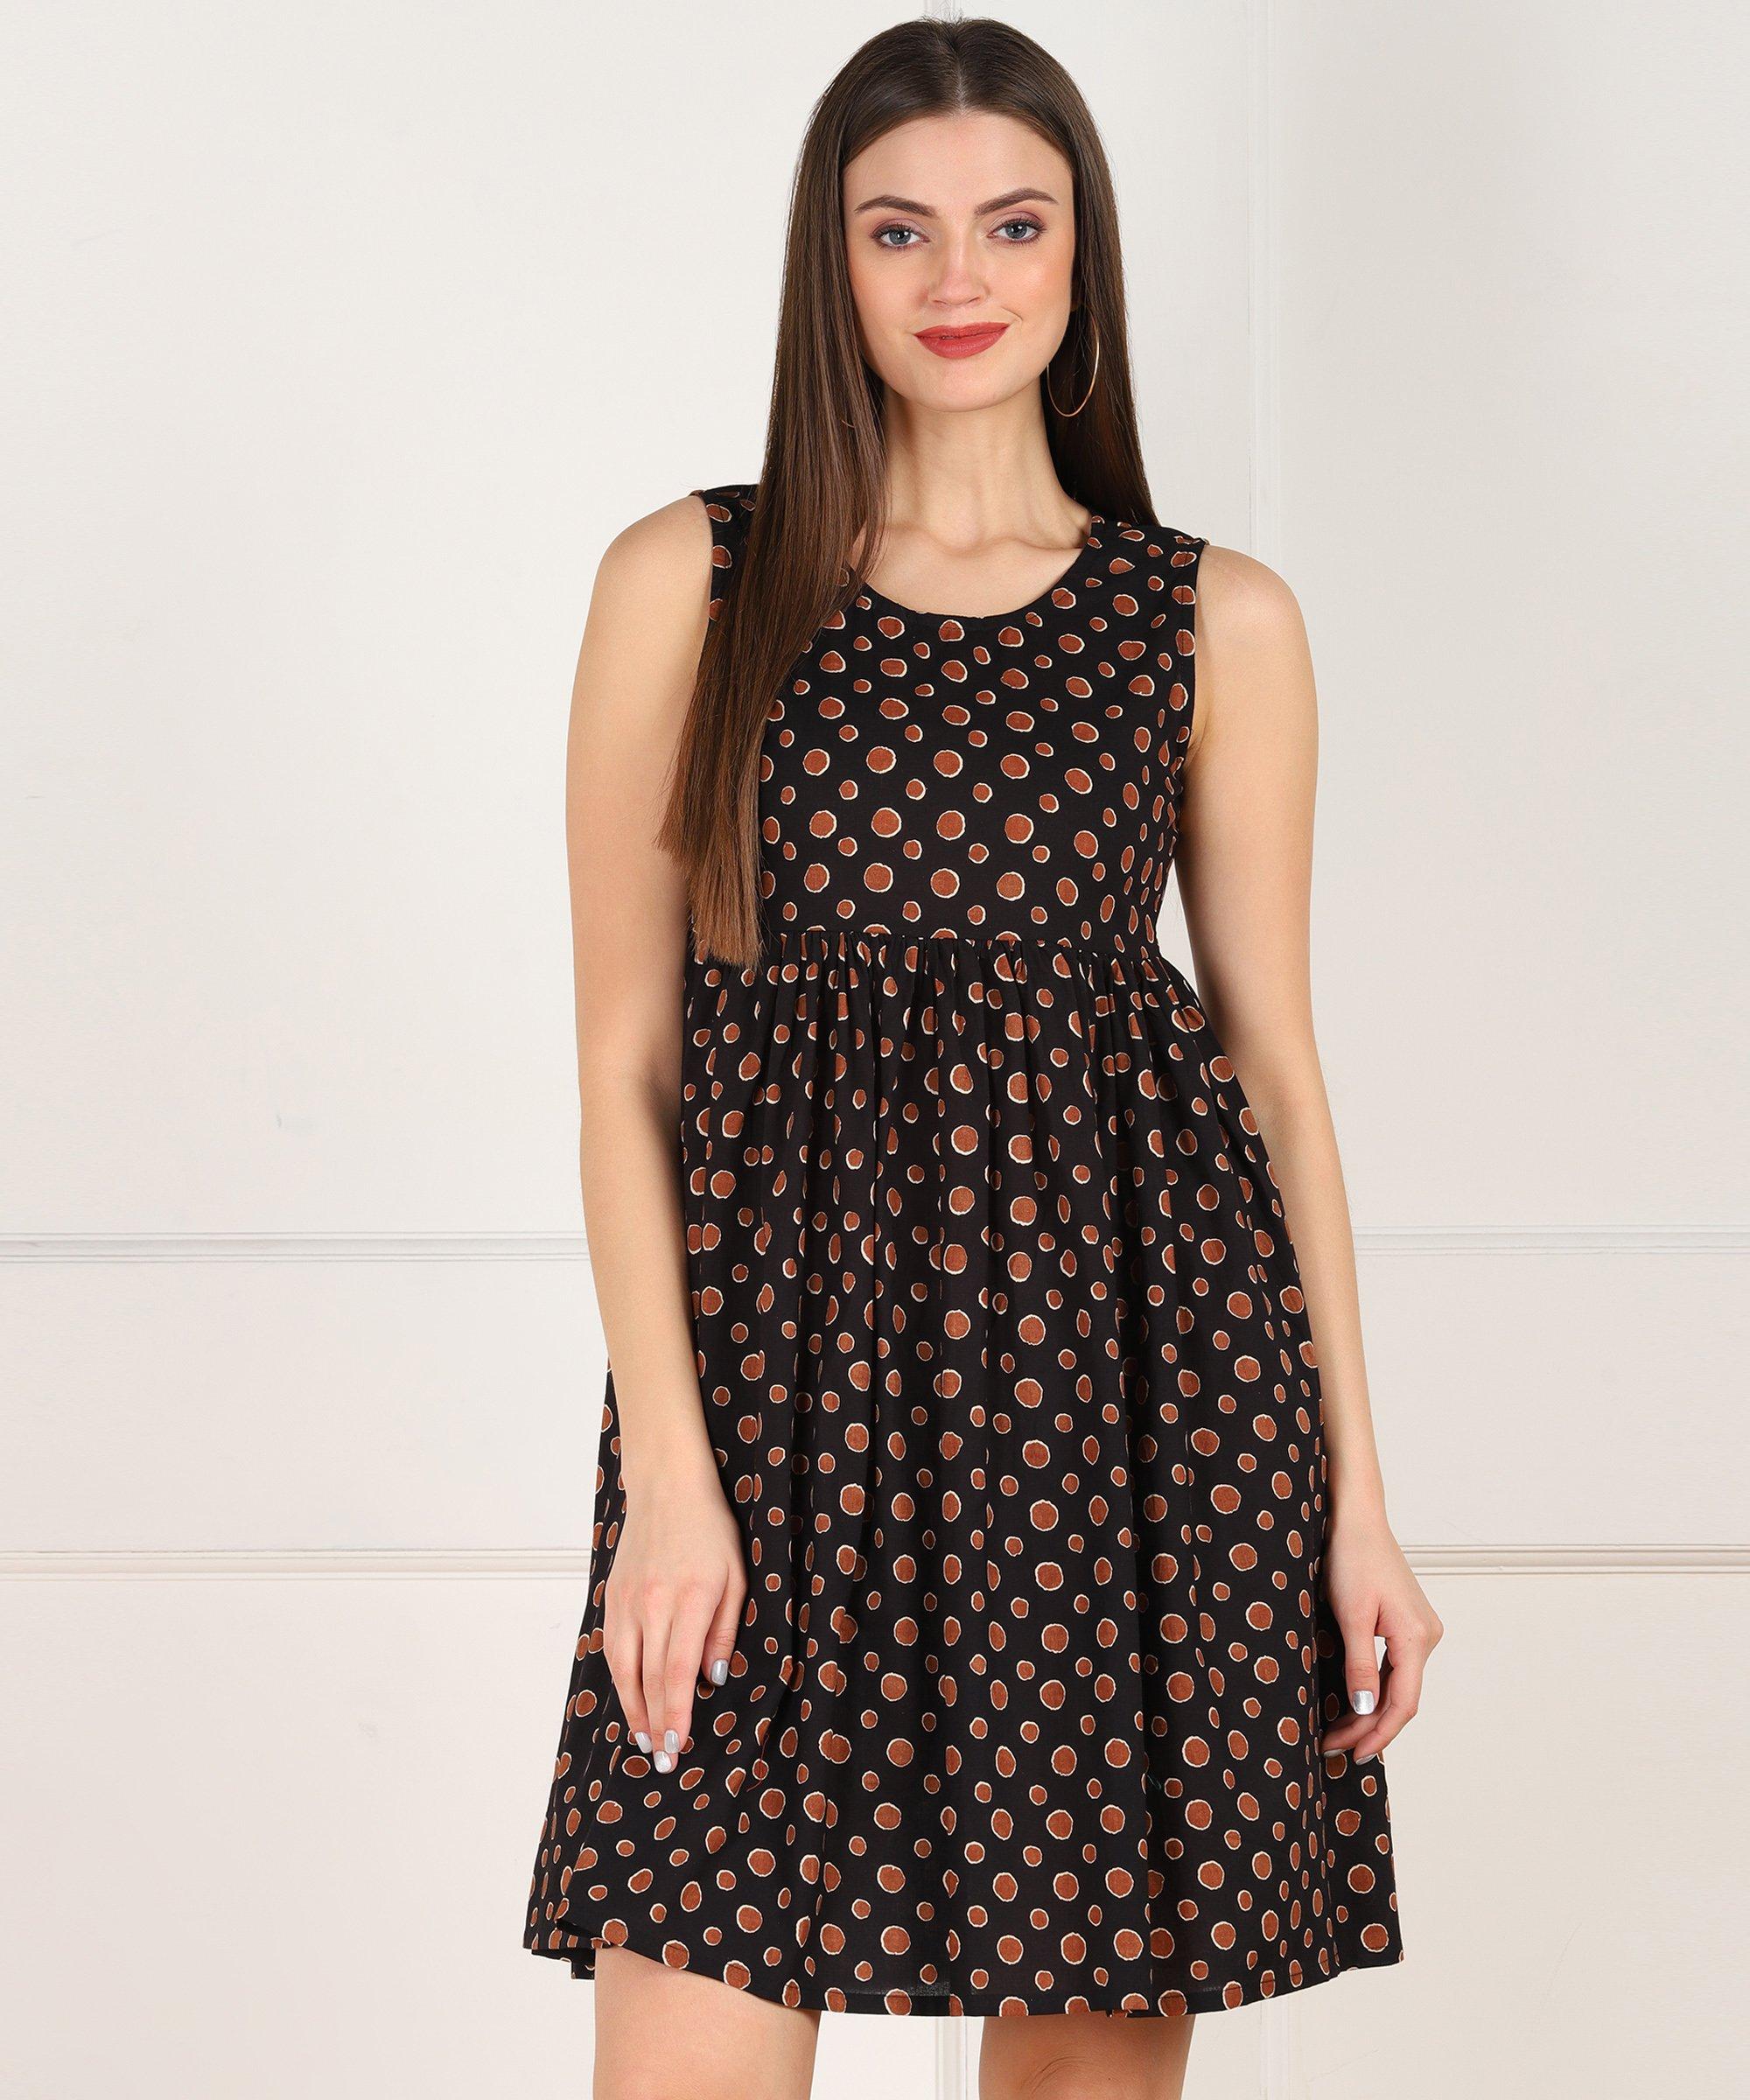 ZNX CLOTHING |  Women Brown Polka Printed Black Short Dress